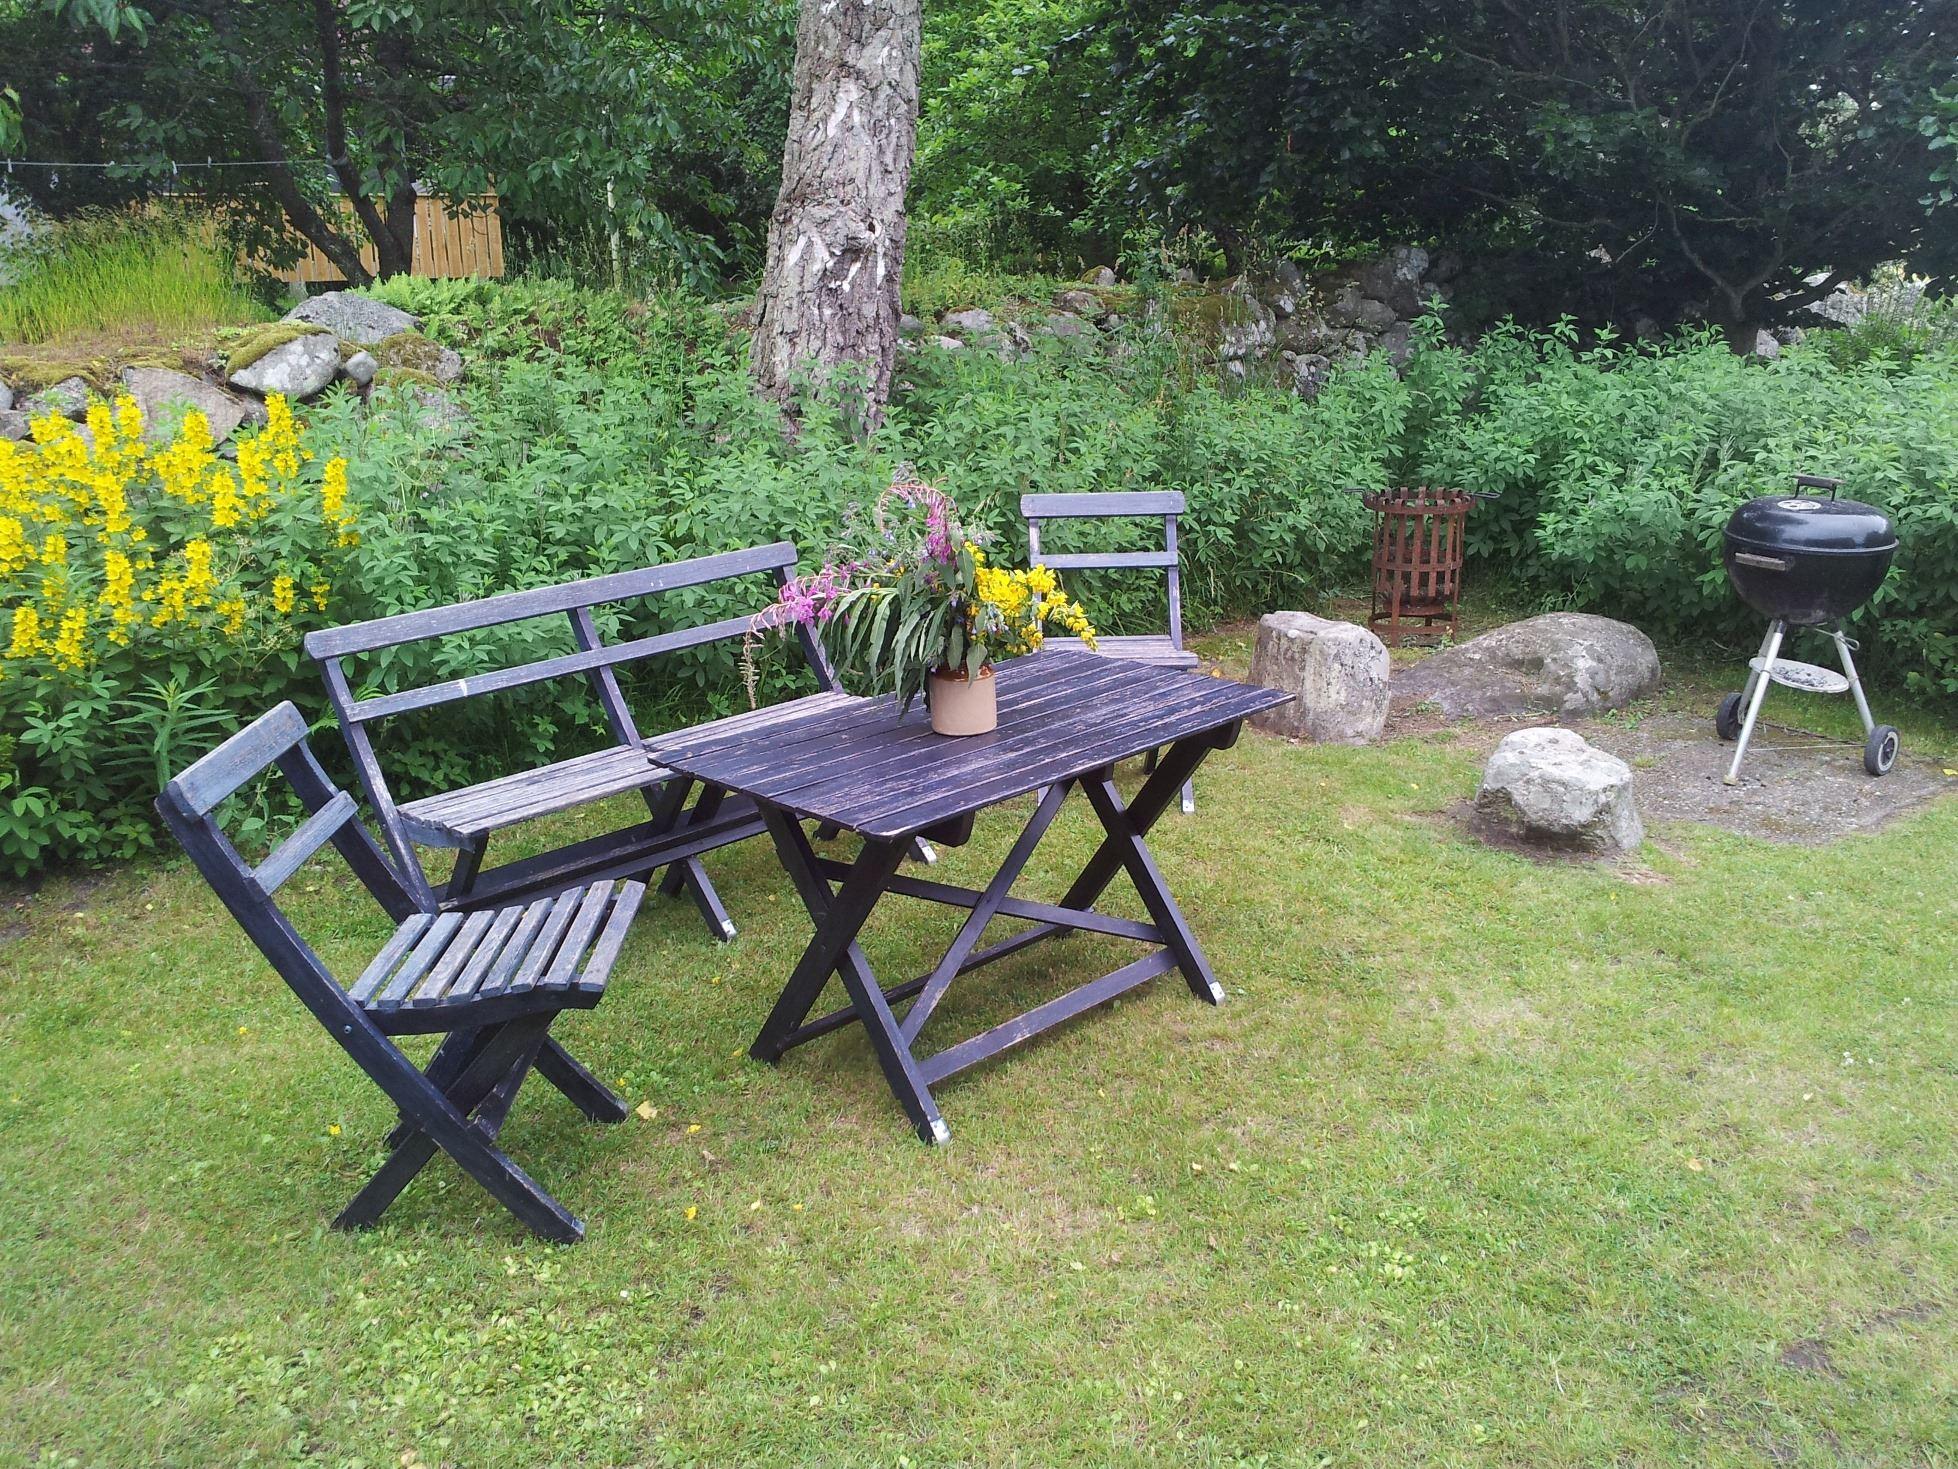 Cottage with 6 beds in lovely Sandviken